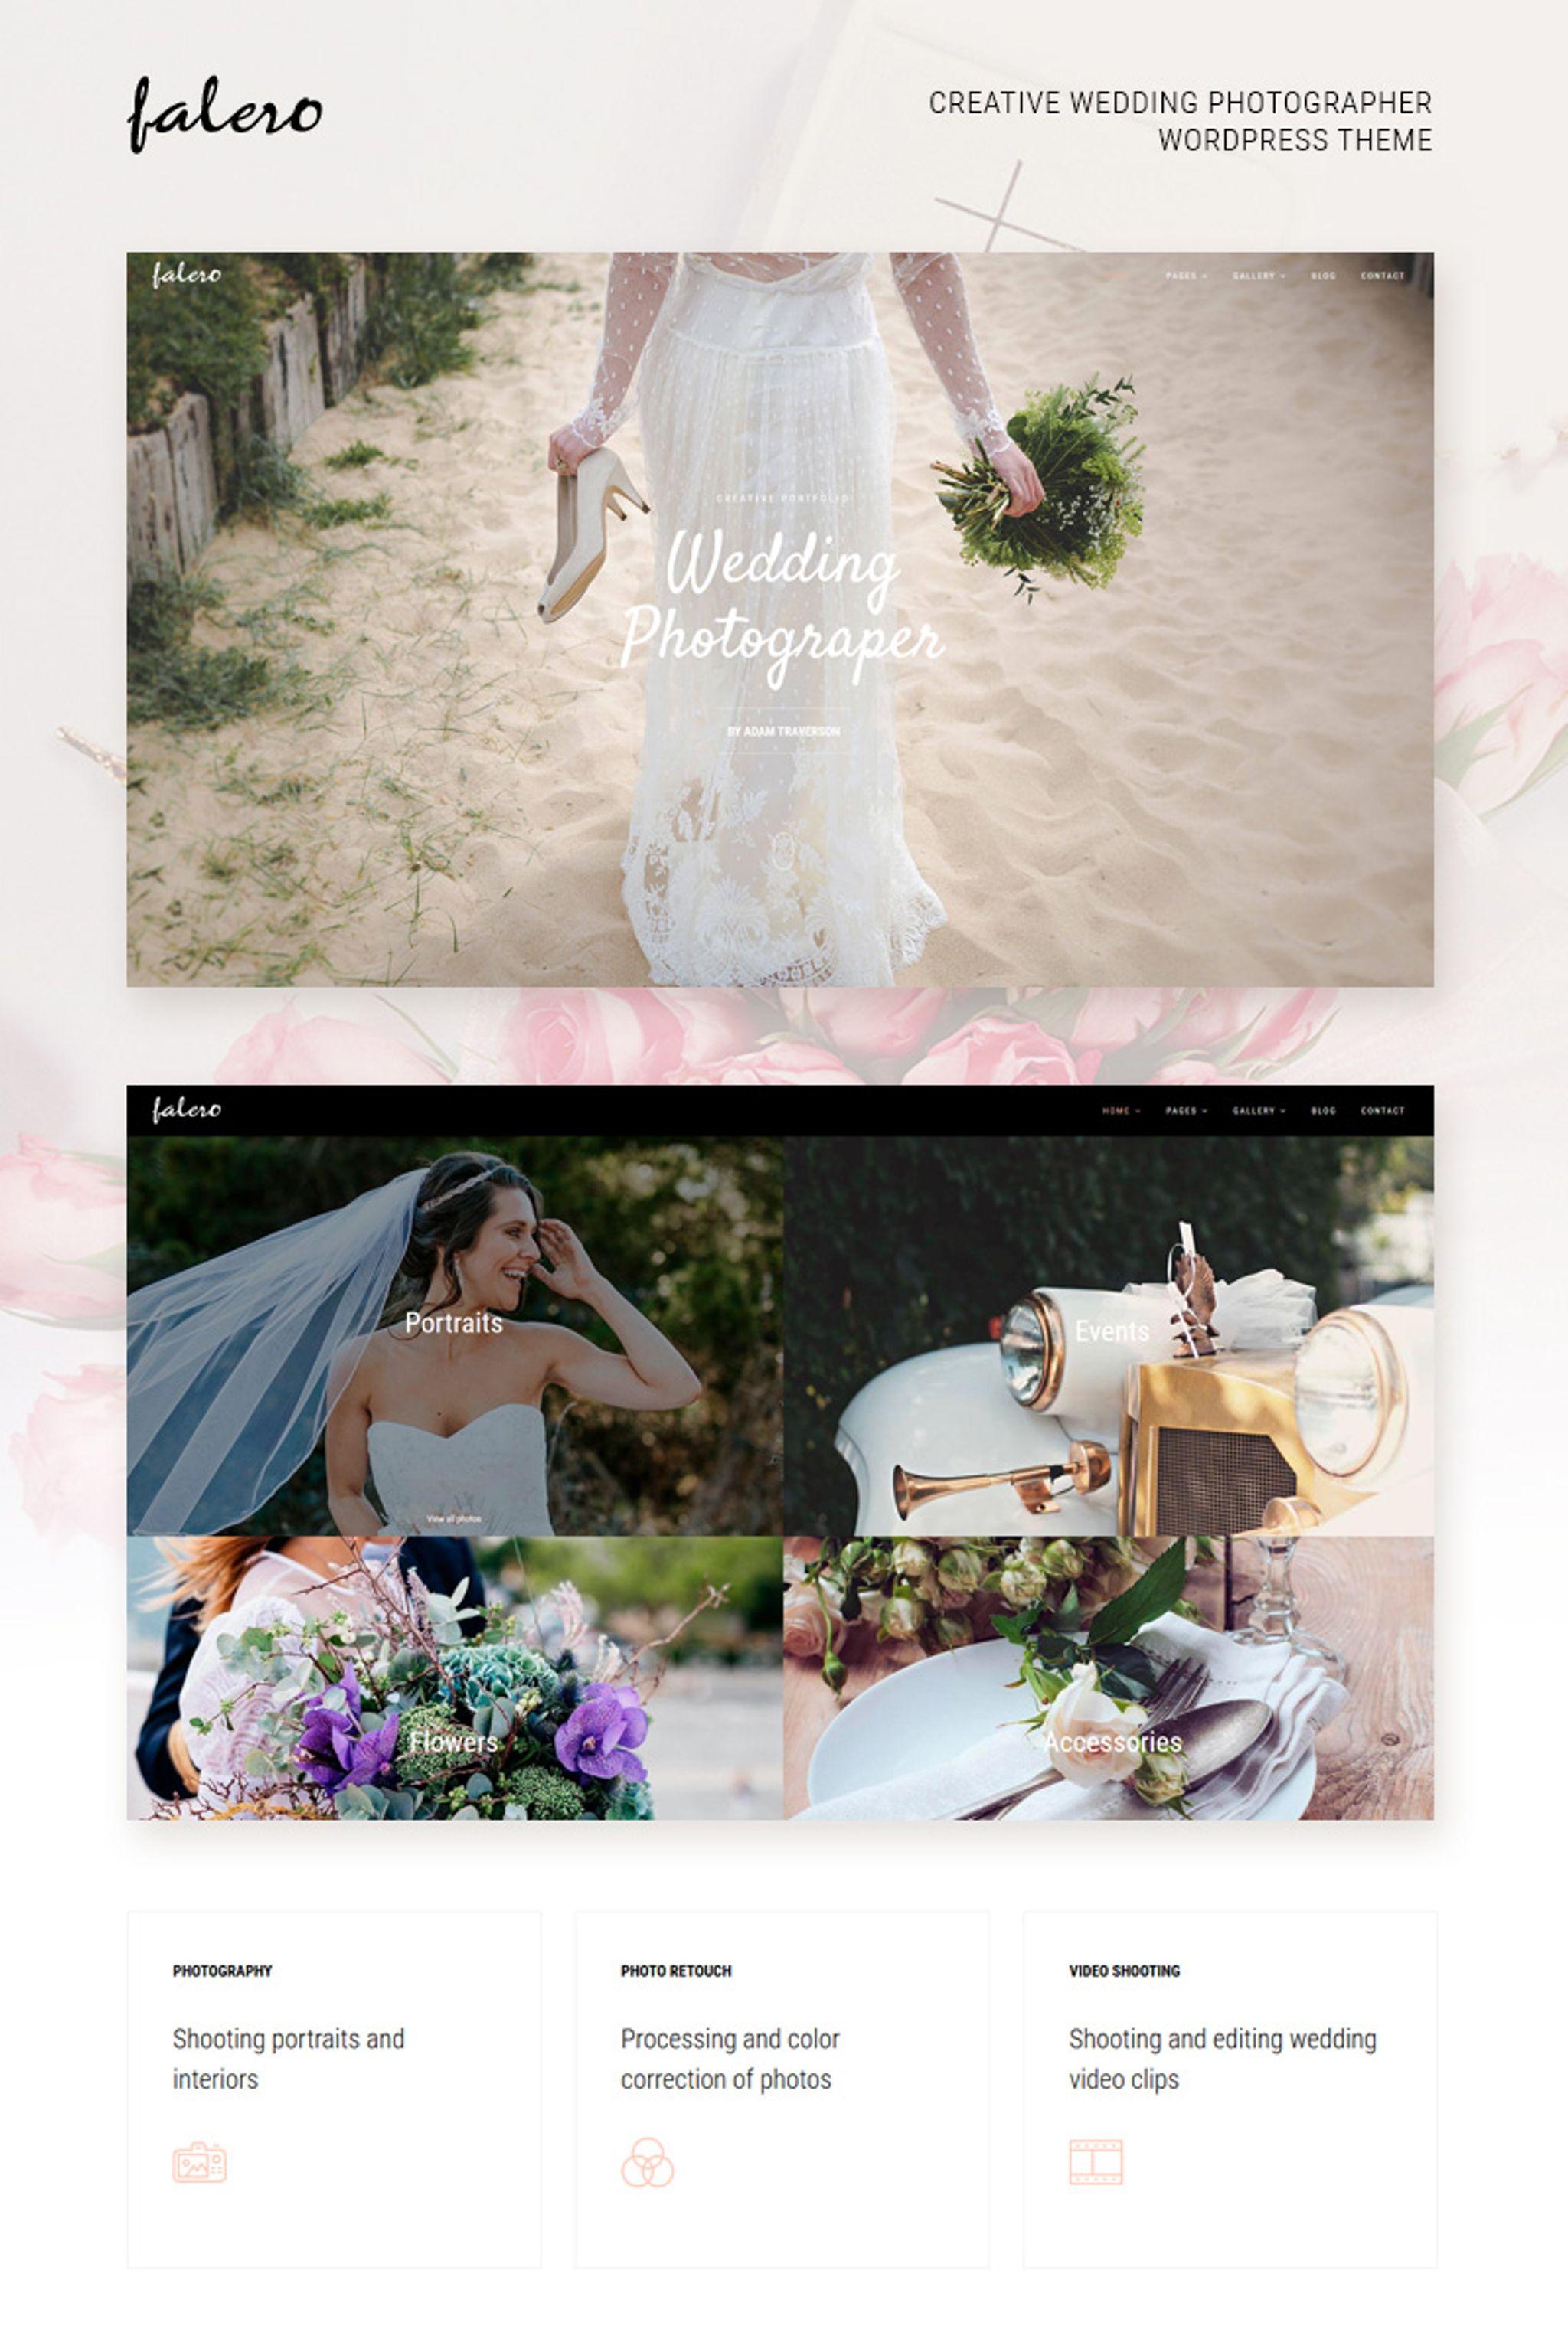 """Falero Wedding Photographer"" thème WordPress adaptatif #64448 - screenshot"